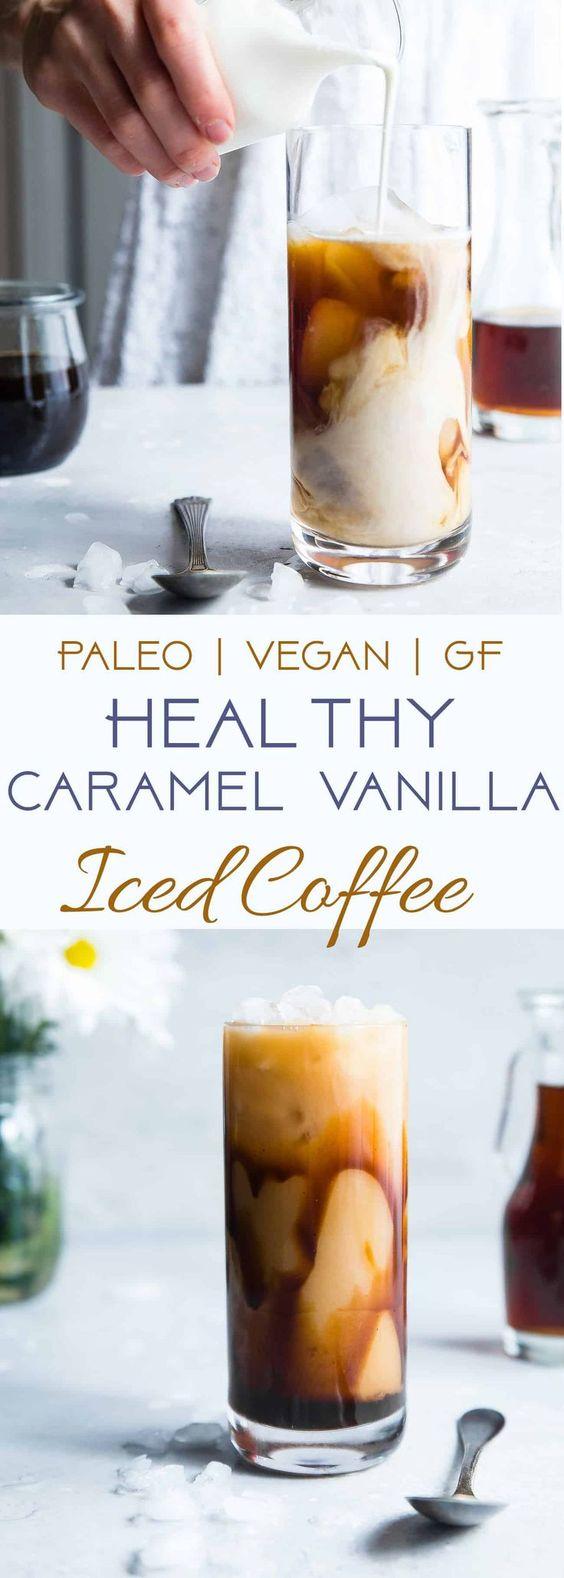 Homemade Caramel Vanilla Iced Coffee